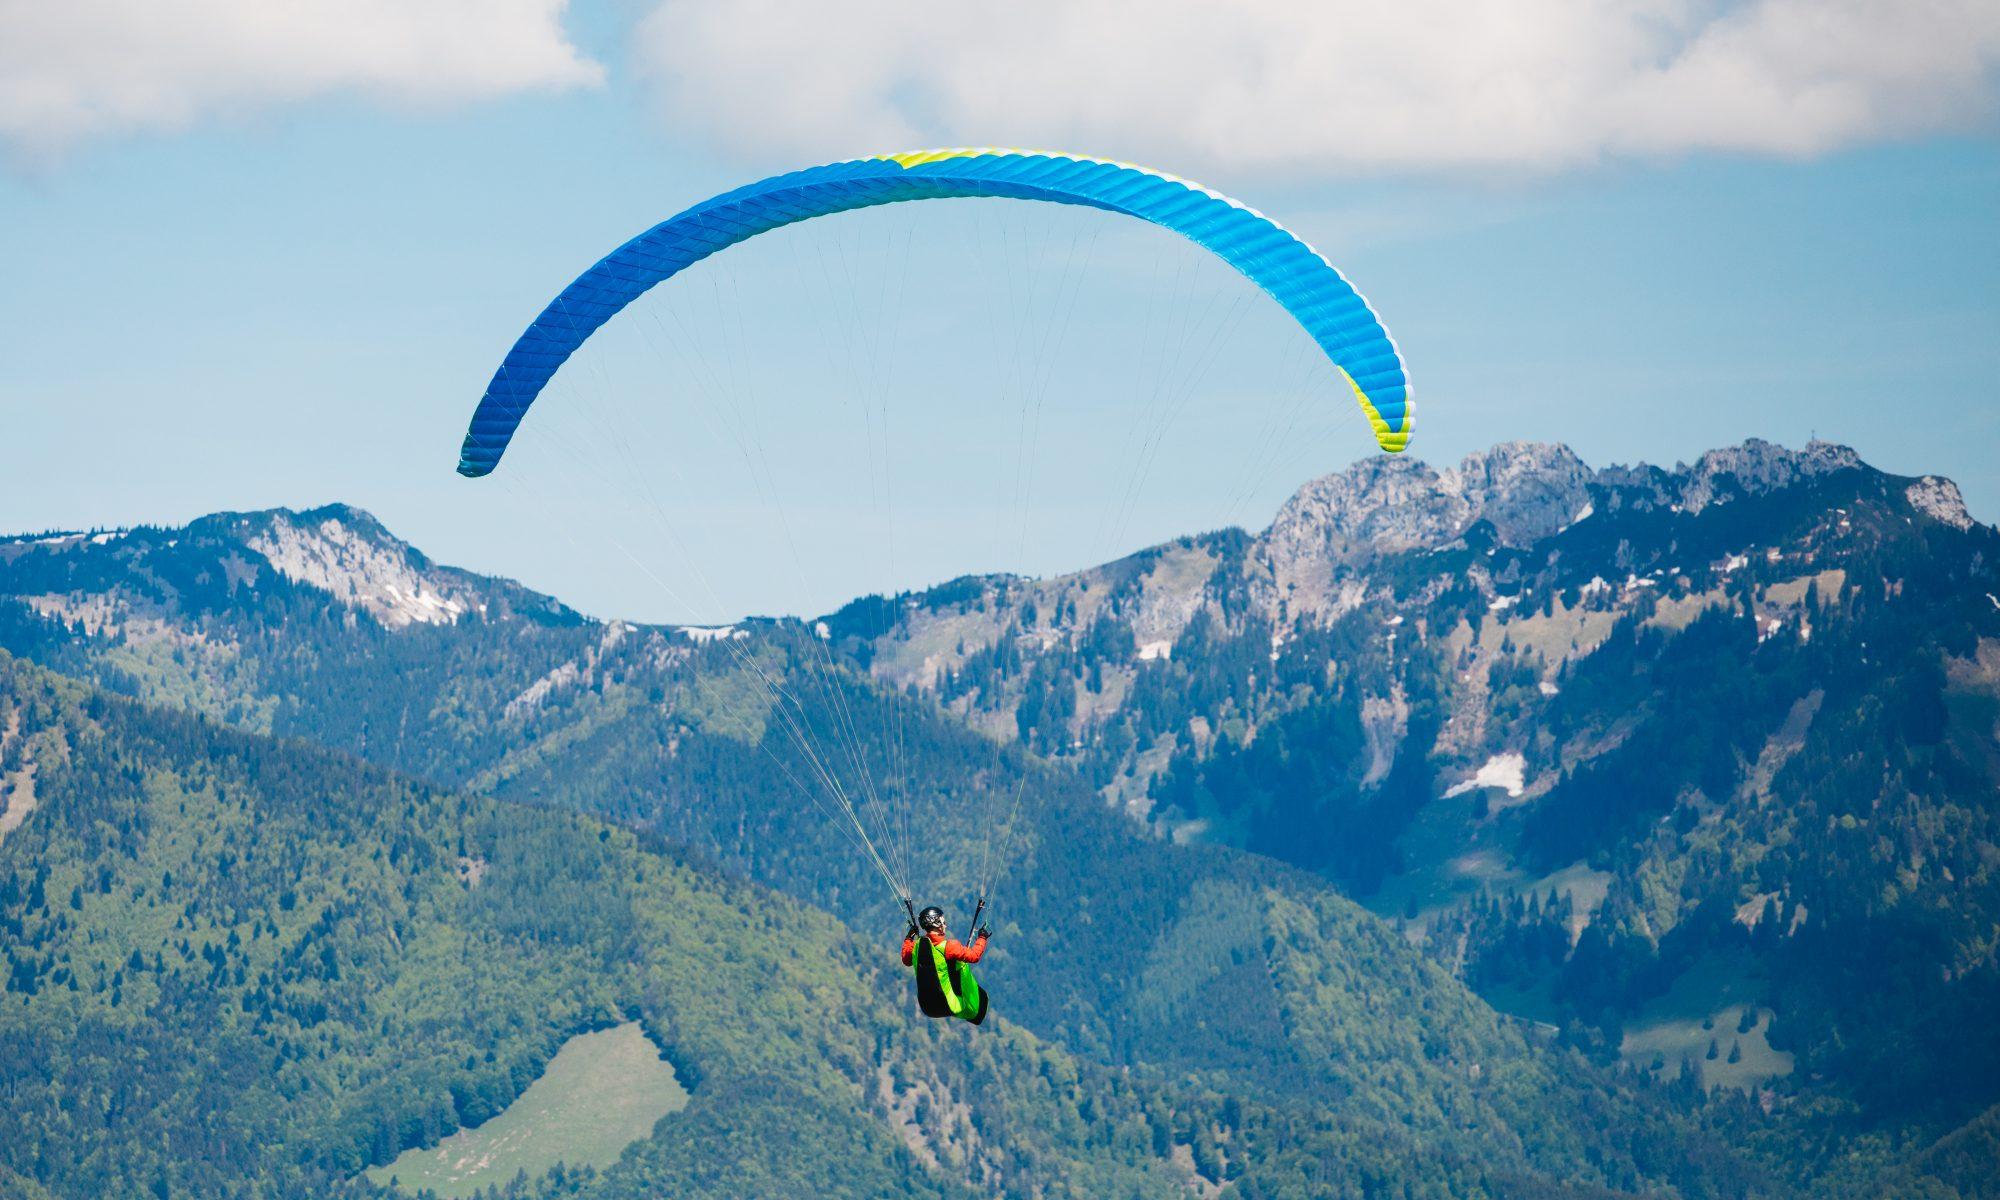 Параплан FireStarter EN-C S.E.A. Paragliders